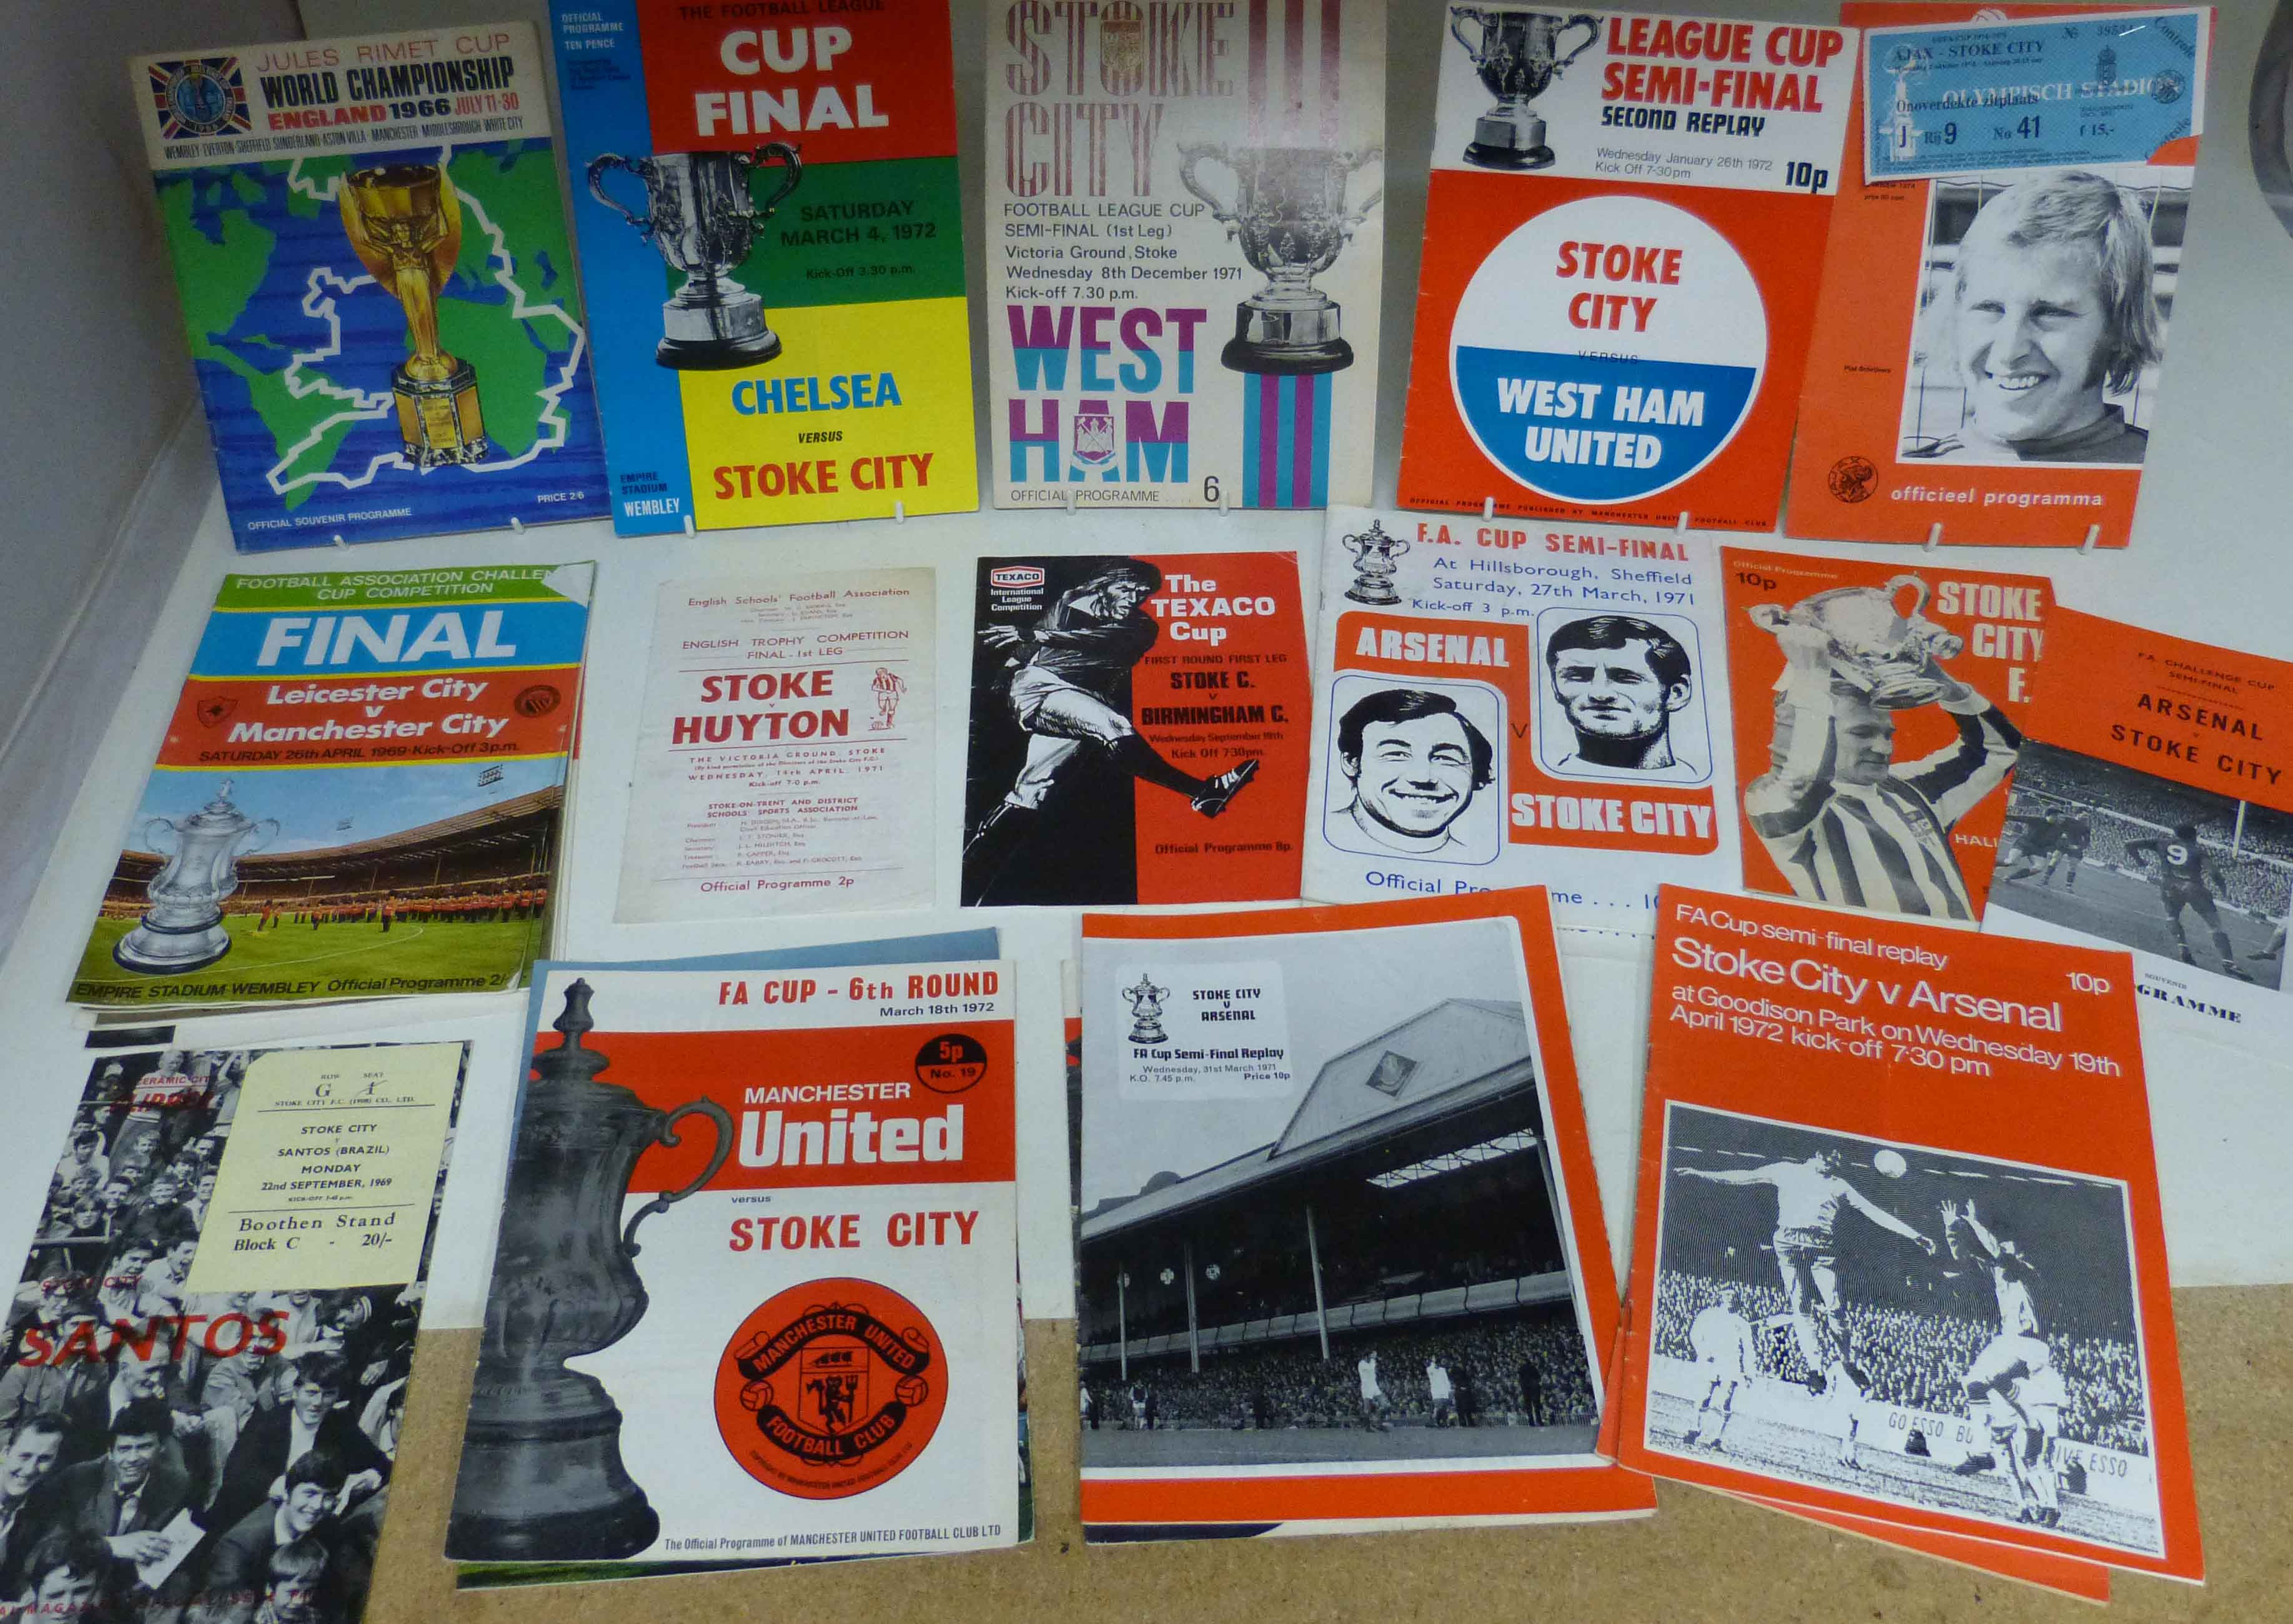 Lot 41 - Stoke City Vs Chelsea 1972 league cup final programmes, Semi-final Vs West Ham (Old Trafford,